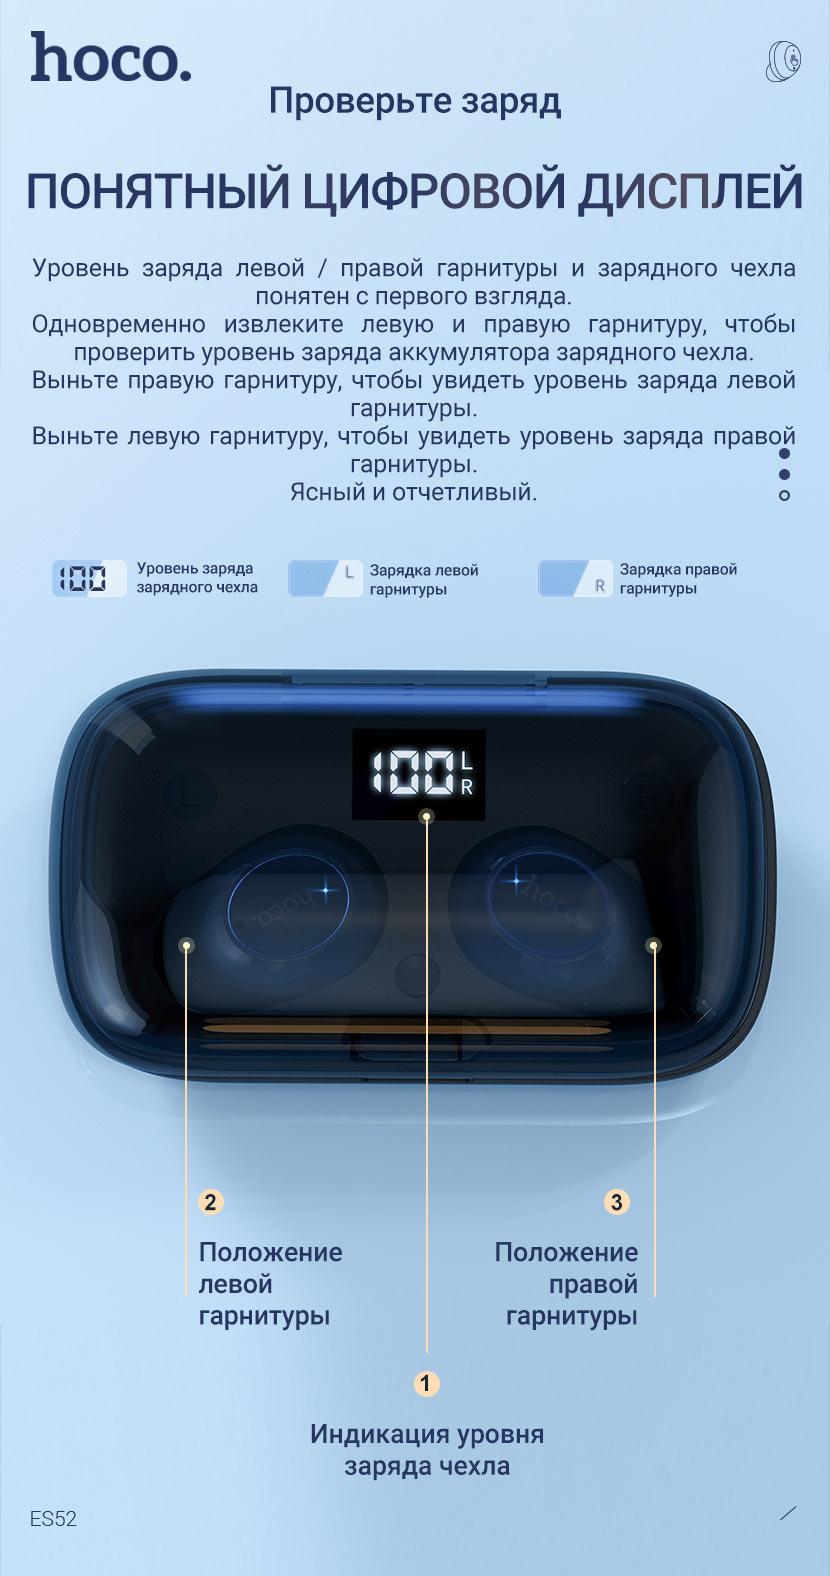 hoco news es52 delight tws wireless bt headset display ru